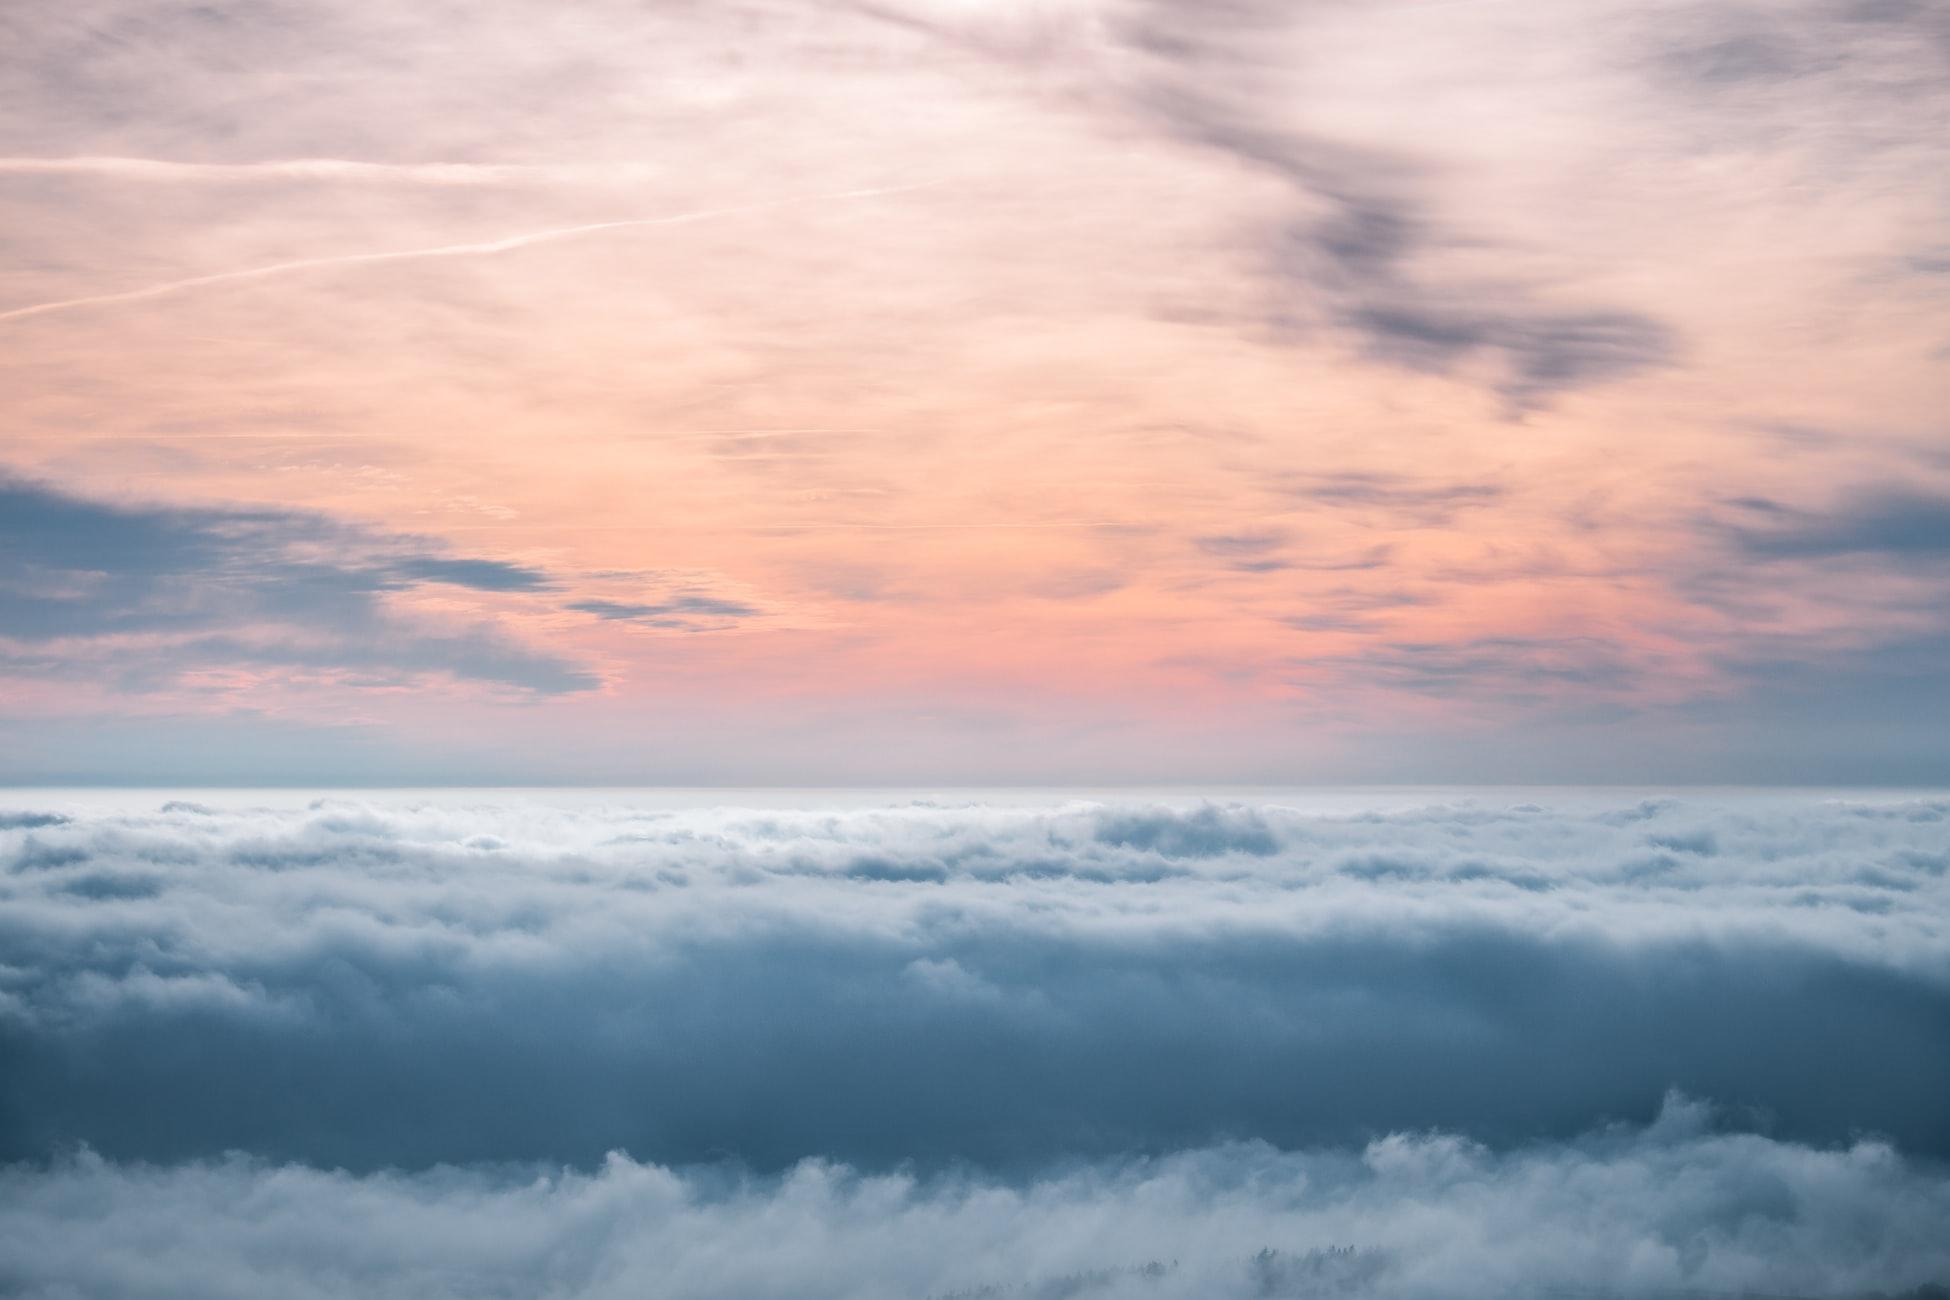 A cloudy sky at sunset